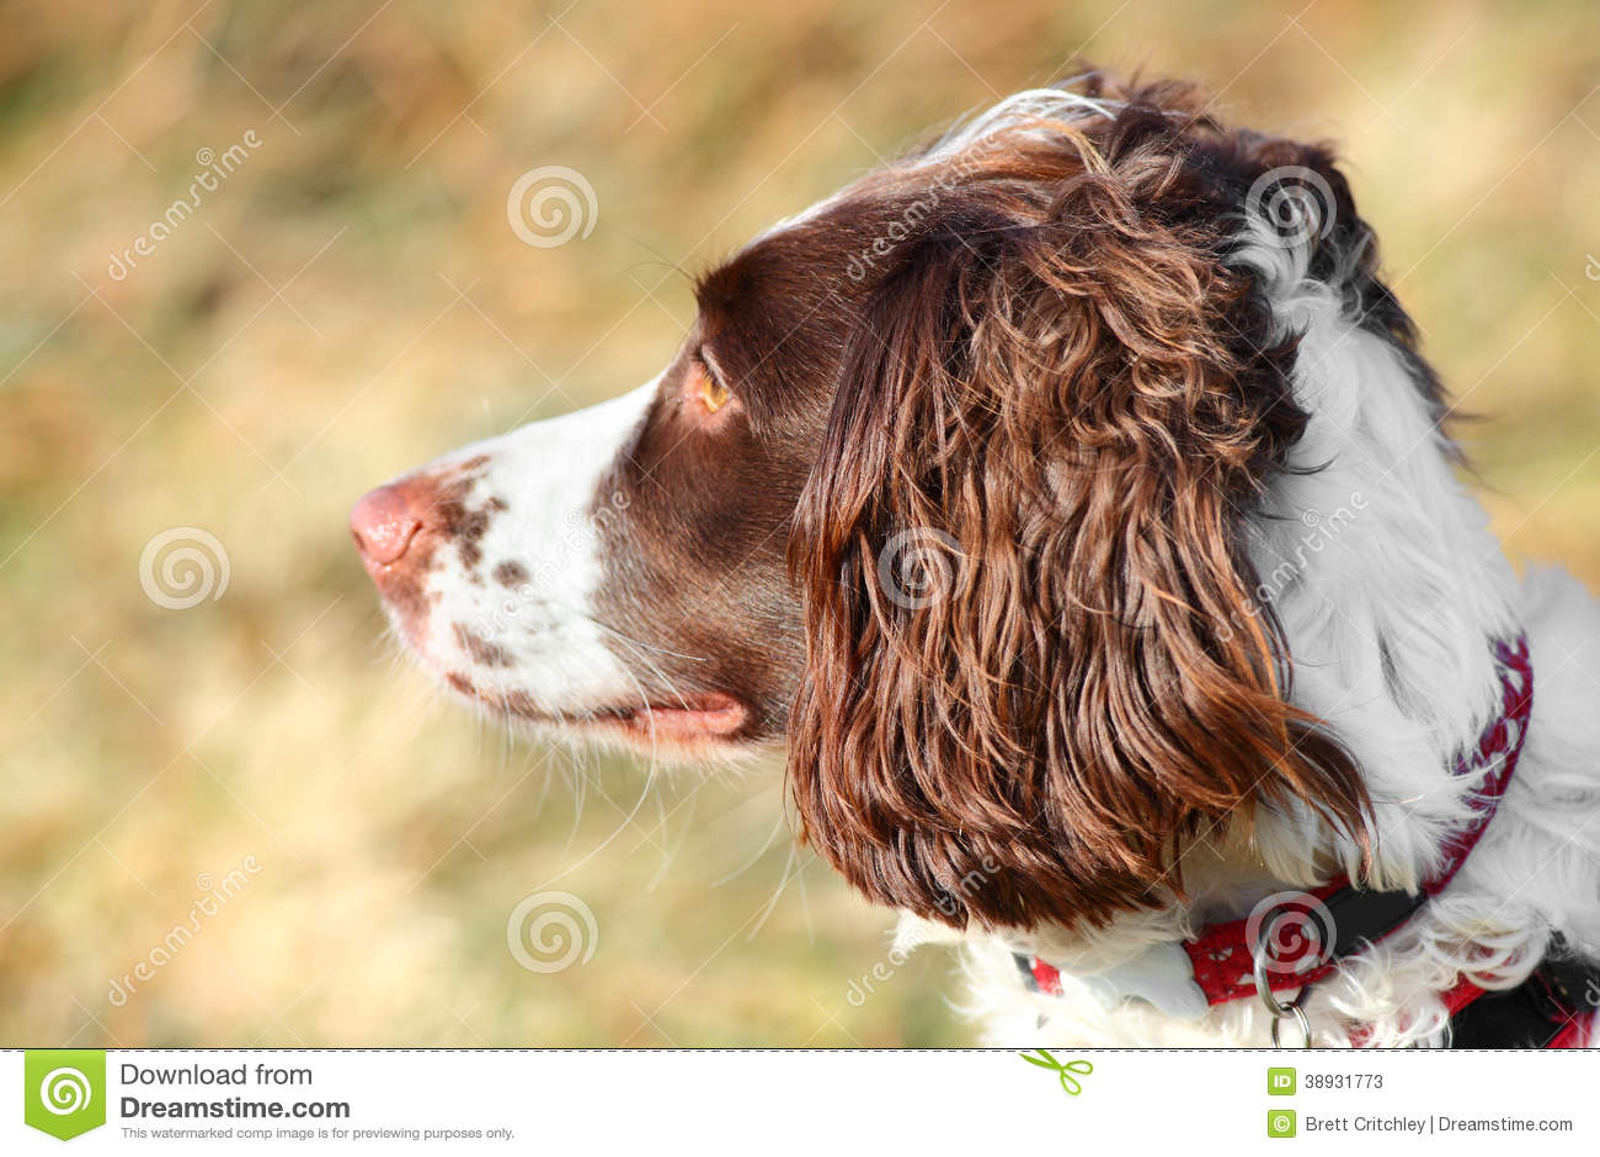 Dogs Ear Spaniel Dog Stock Image Image Of Space Springer